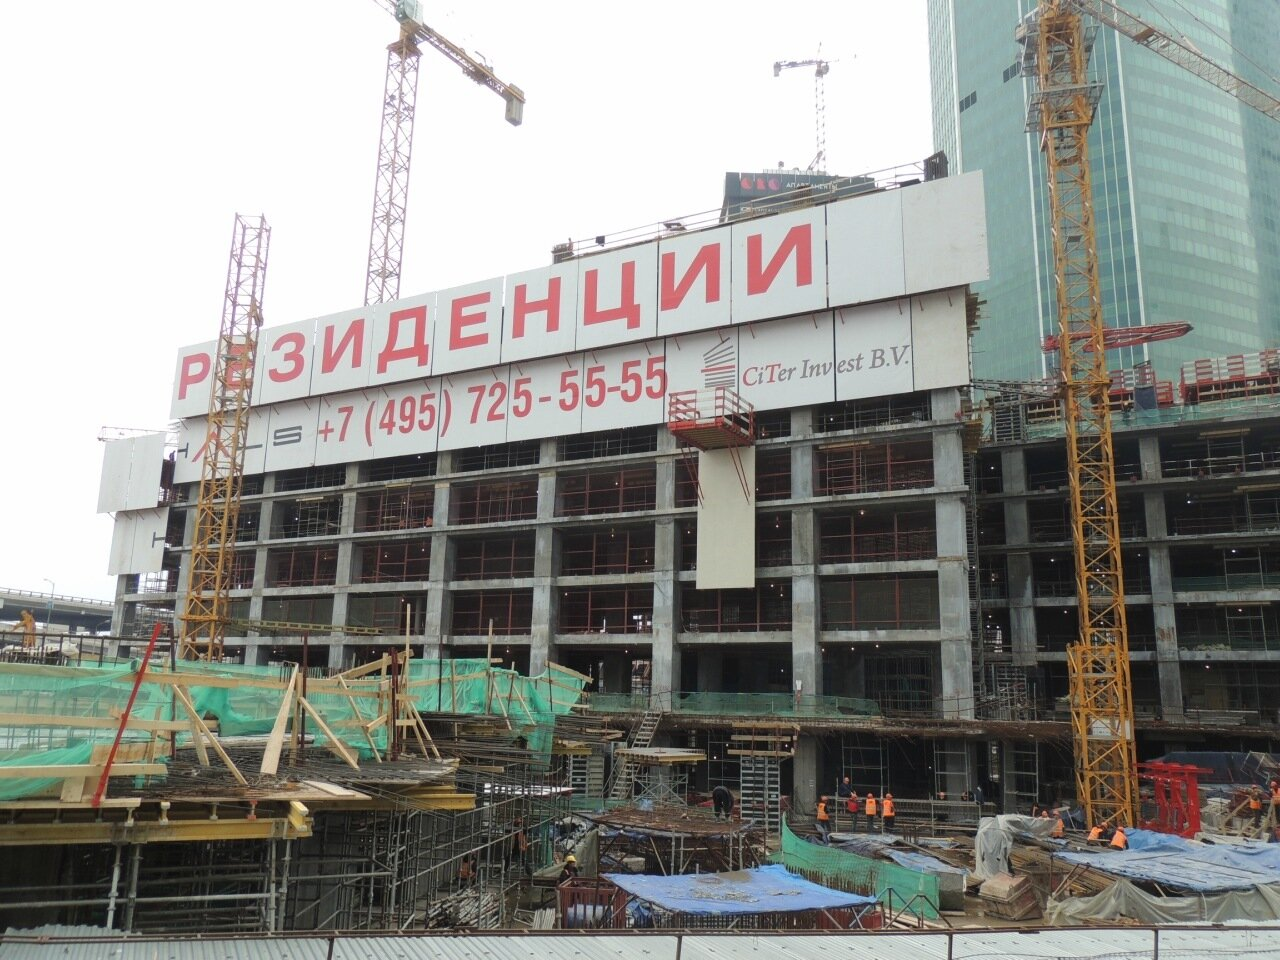 http://img-fotki.yandex.ru/get/6701/8217593.29/0_98d7d_8a882451_XXXL.jpg